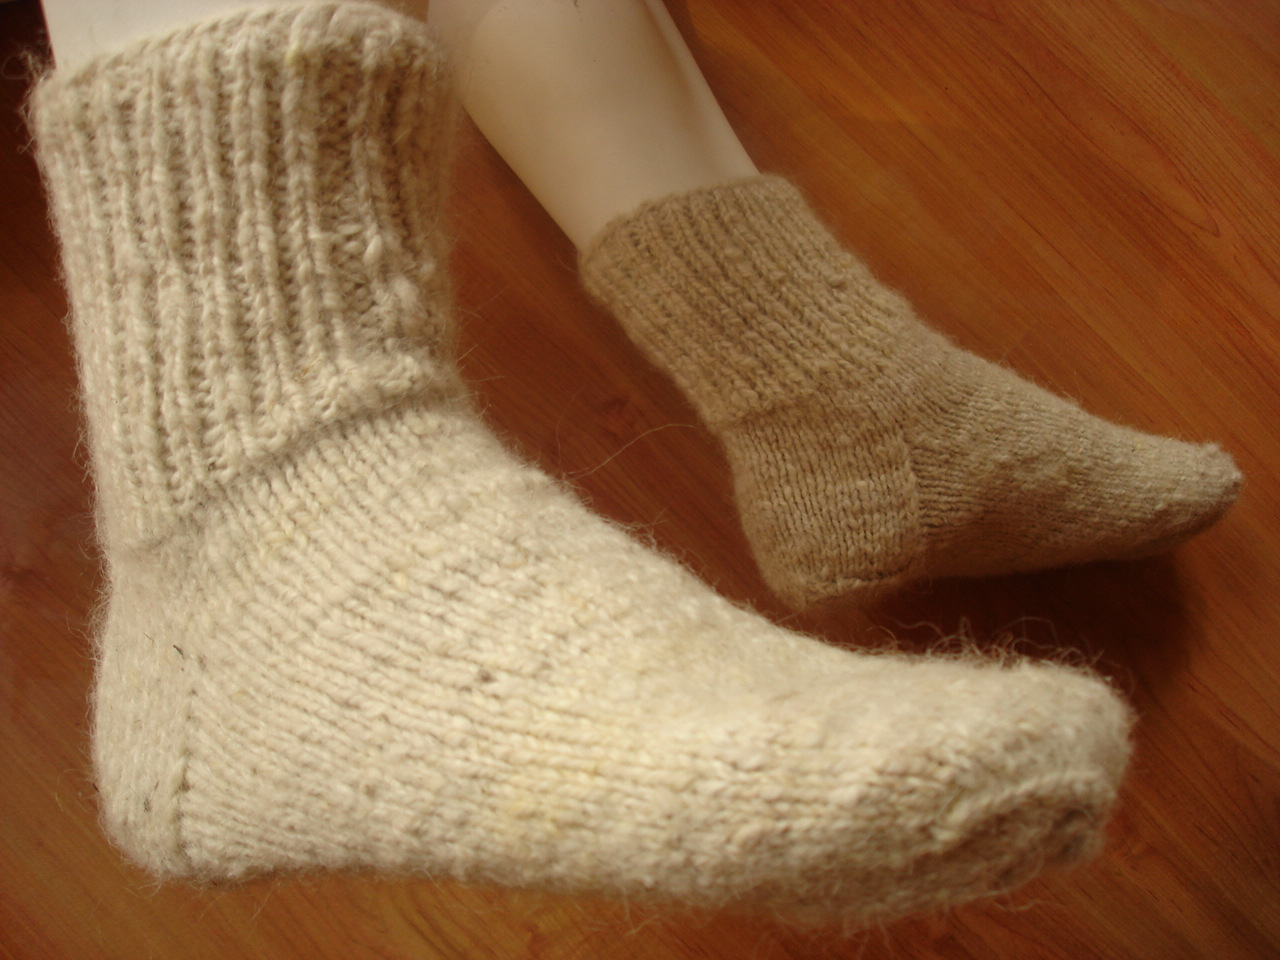 Фото женских ног носки 15 фотография